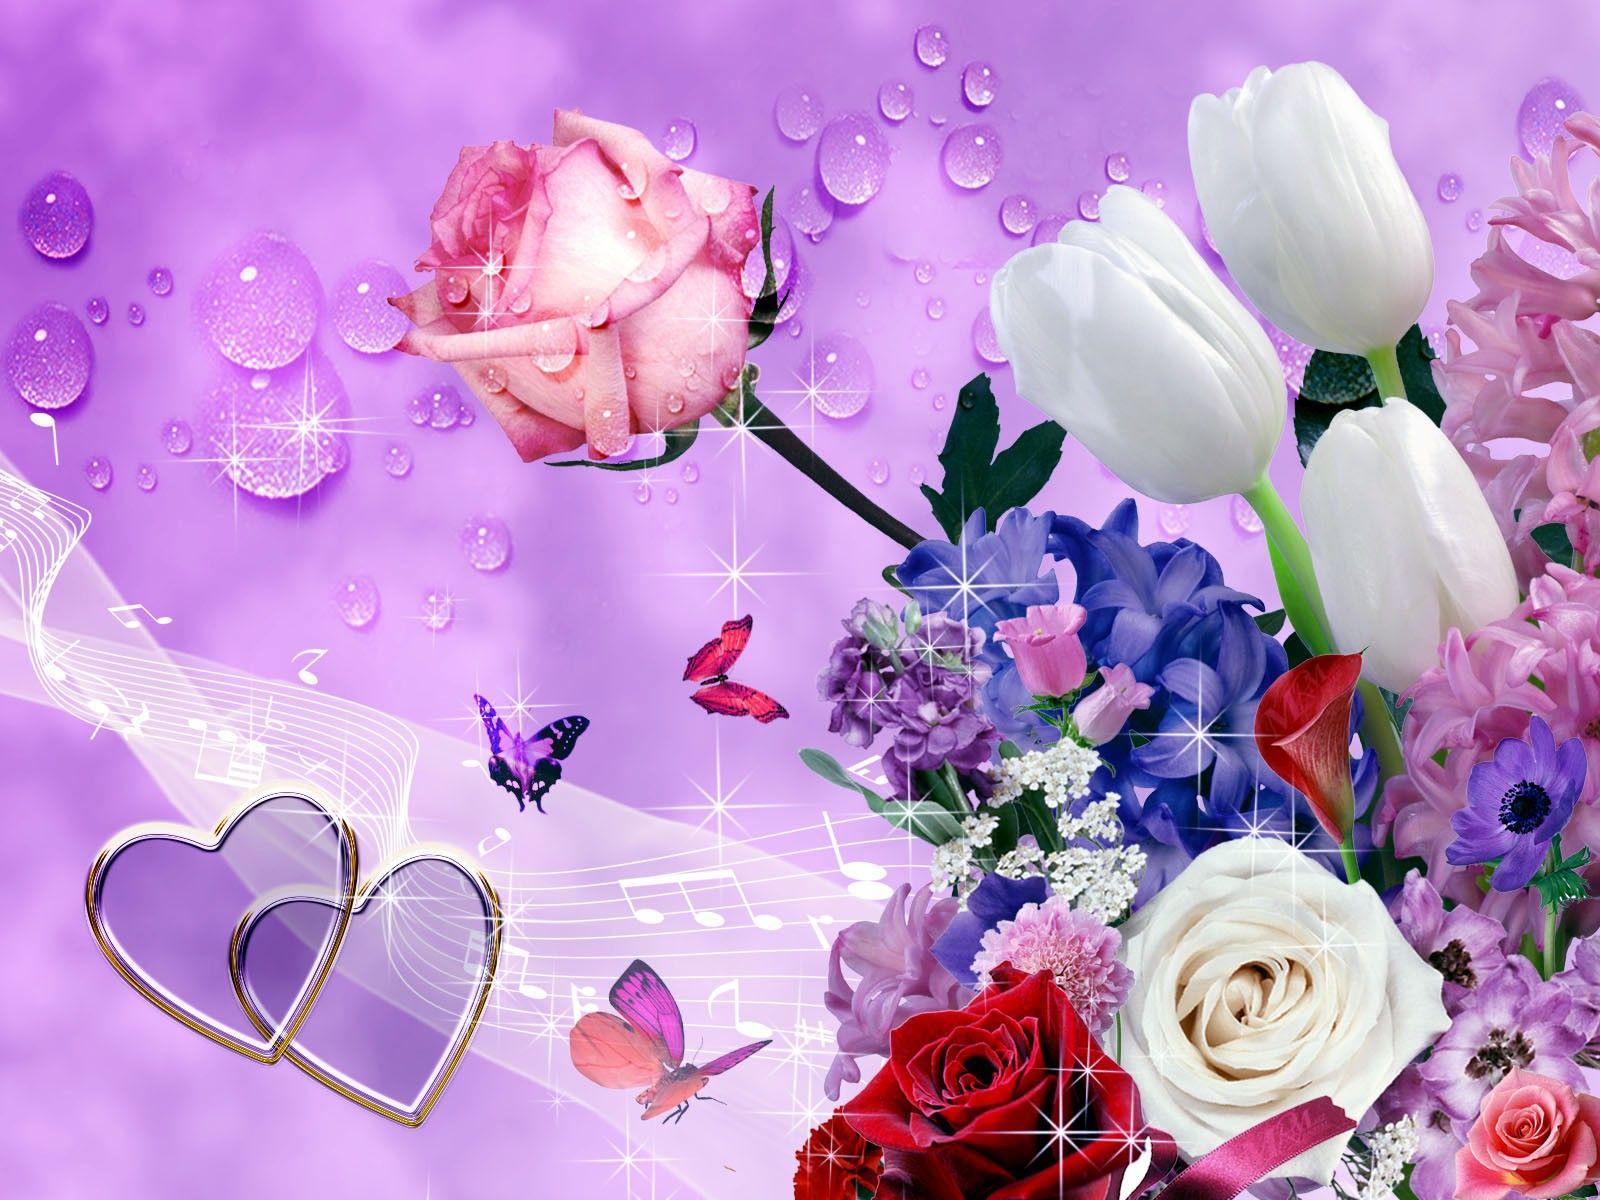 pink flowers wallpaper hd  Champs et Jardins Pinterest